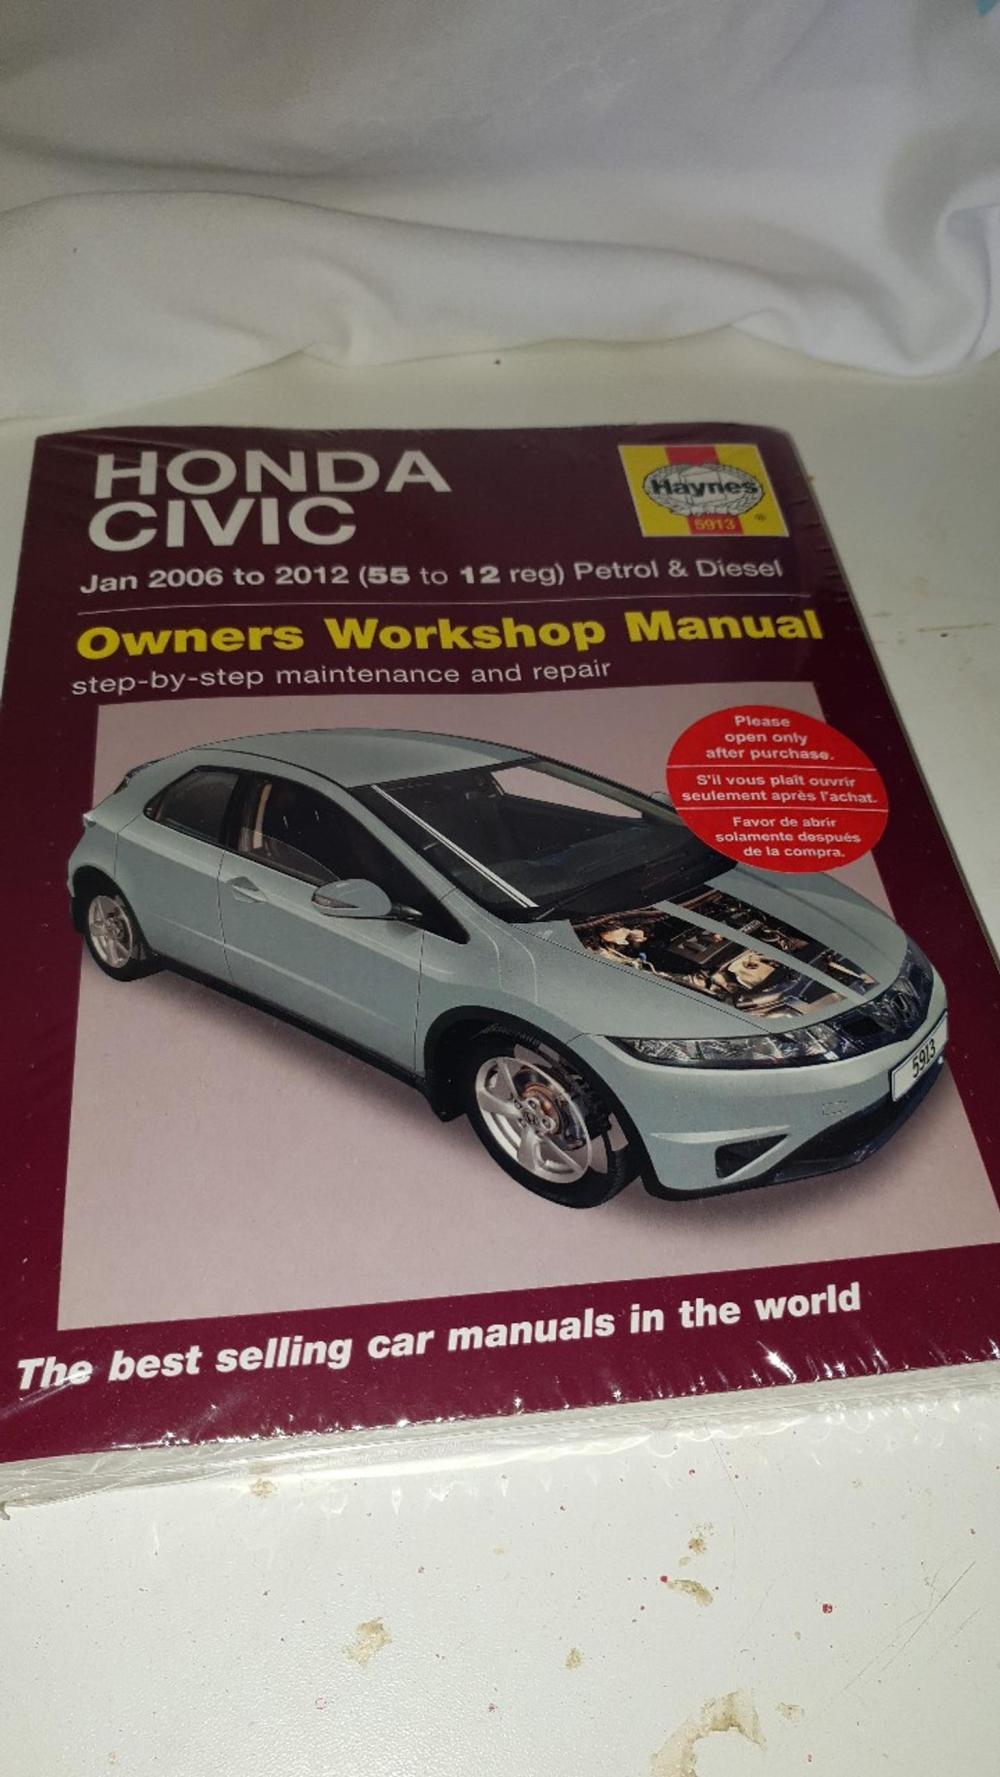 medium resolution of description honda civic owners workshop manual